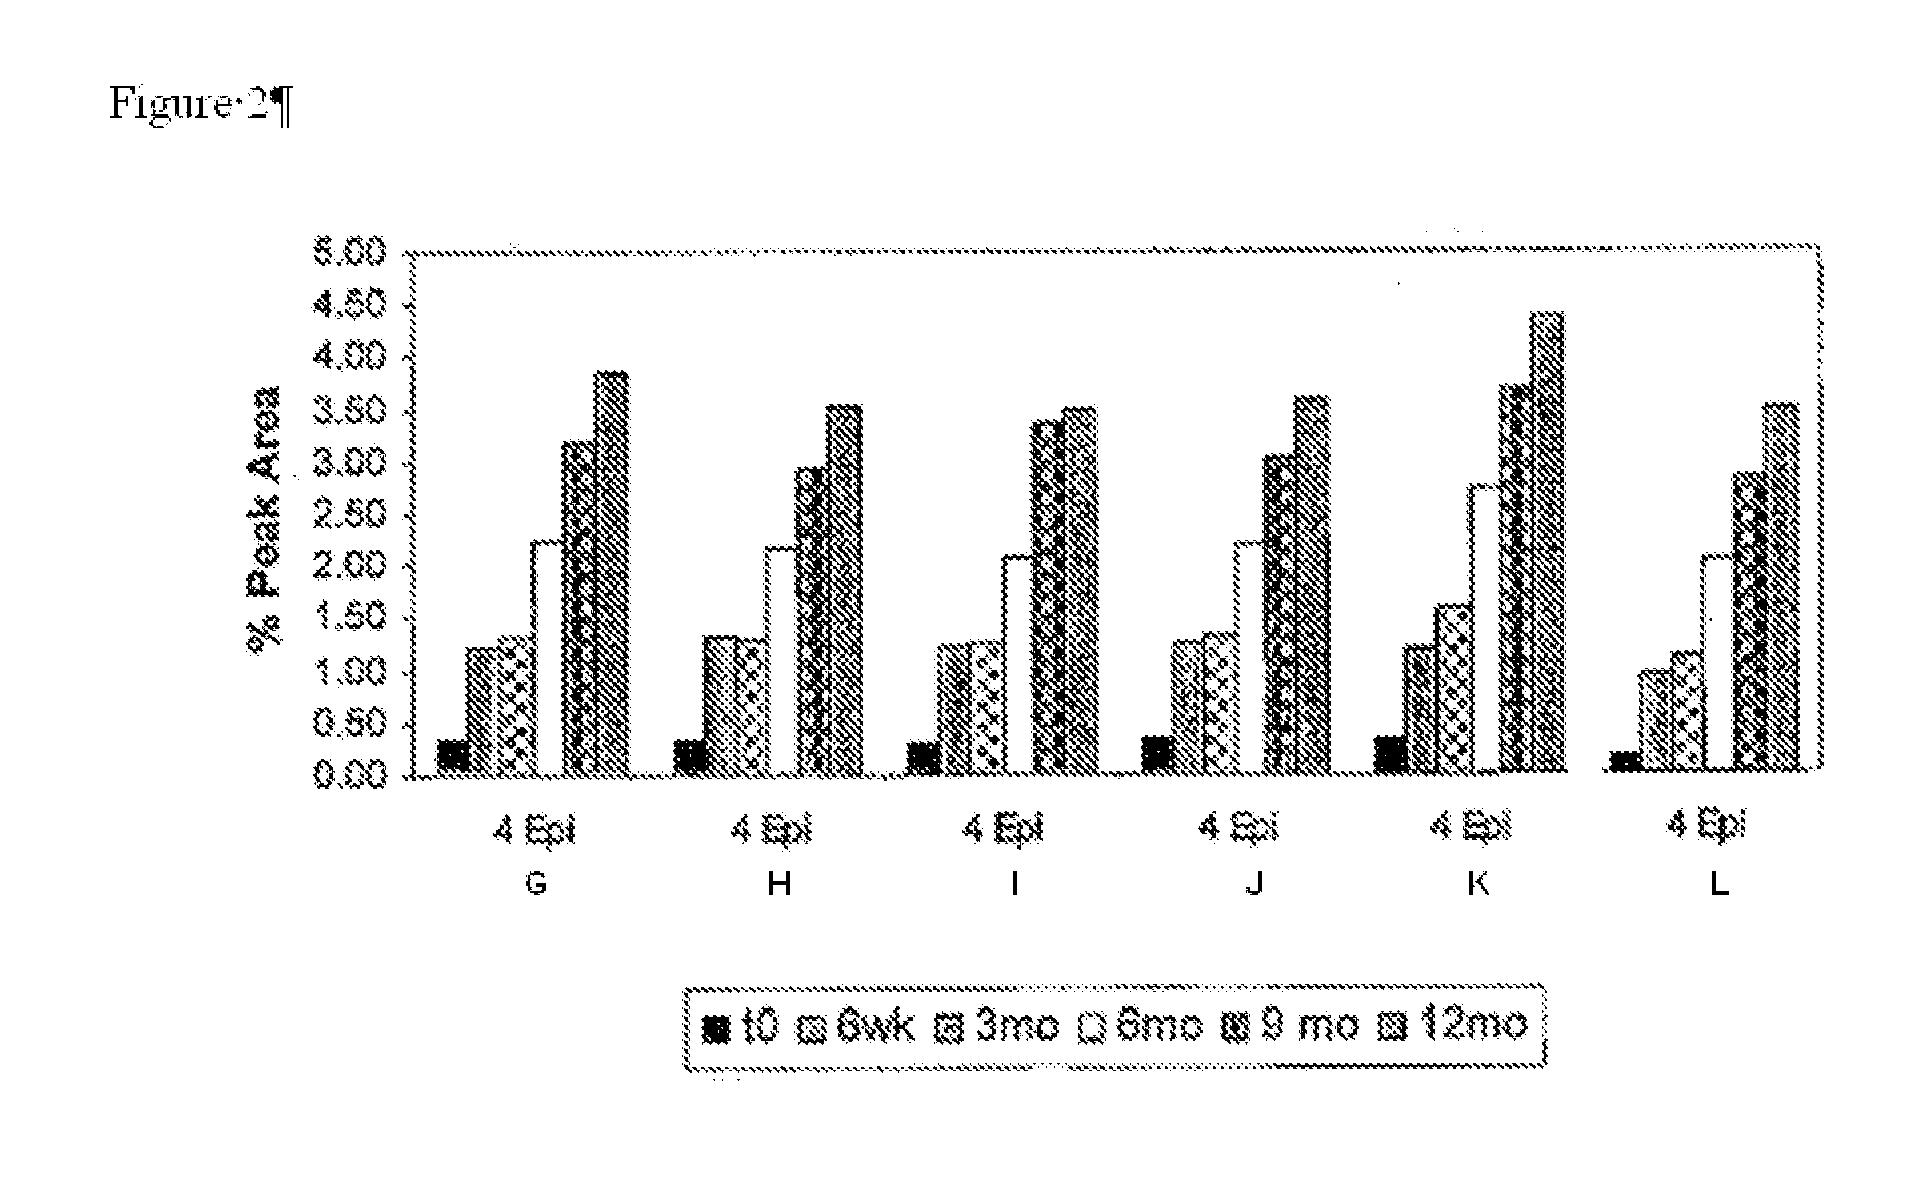 D claritin lisinopril and